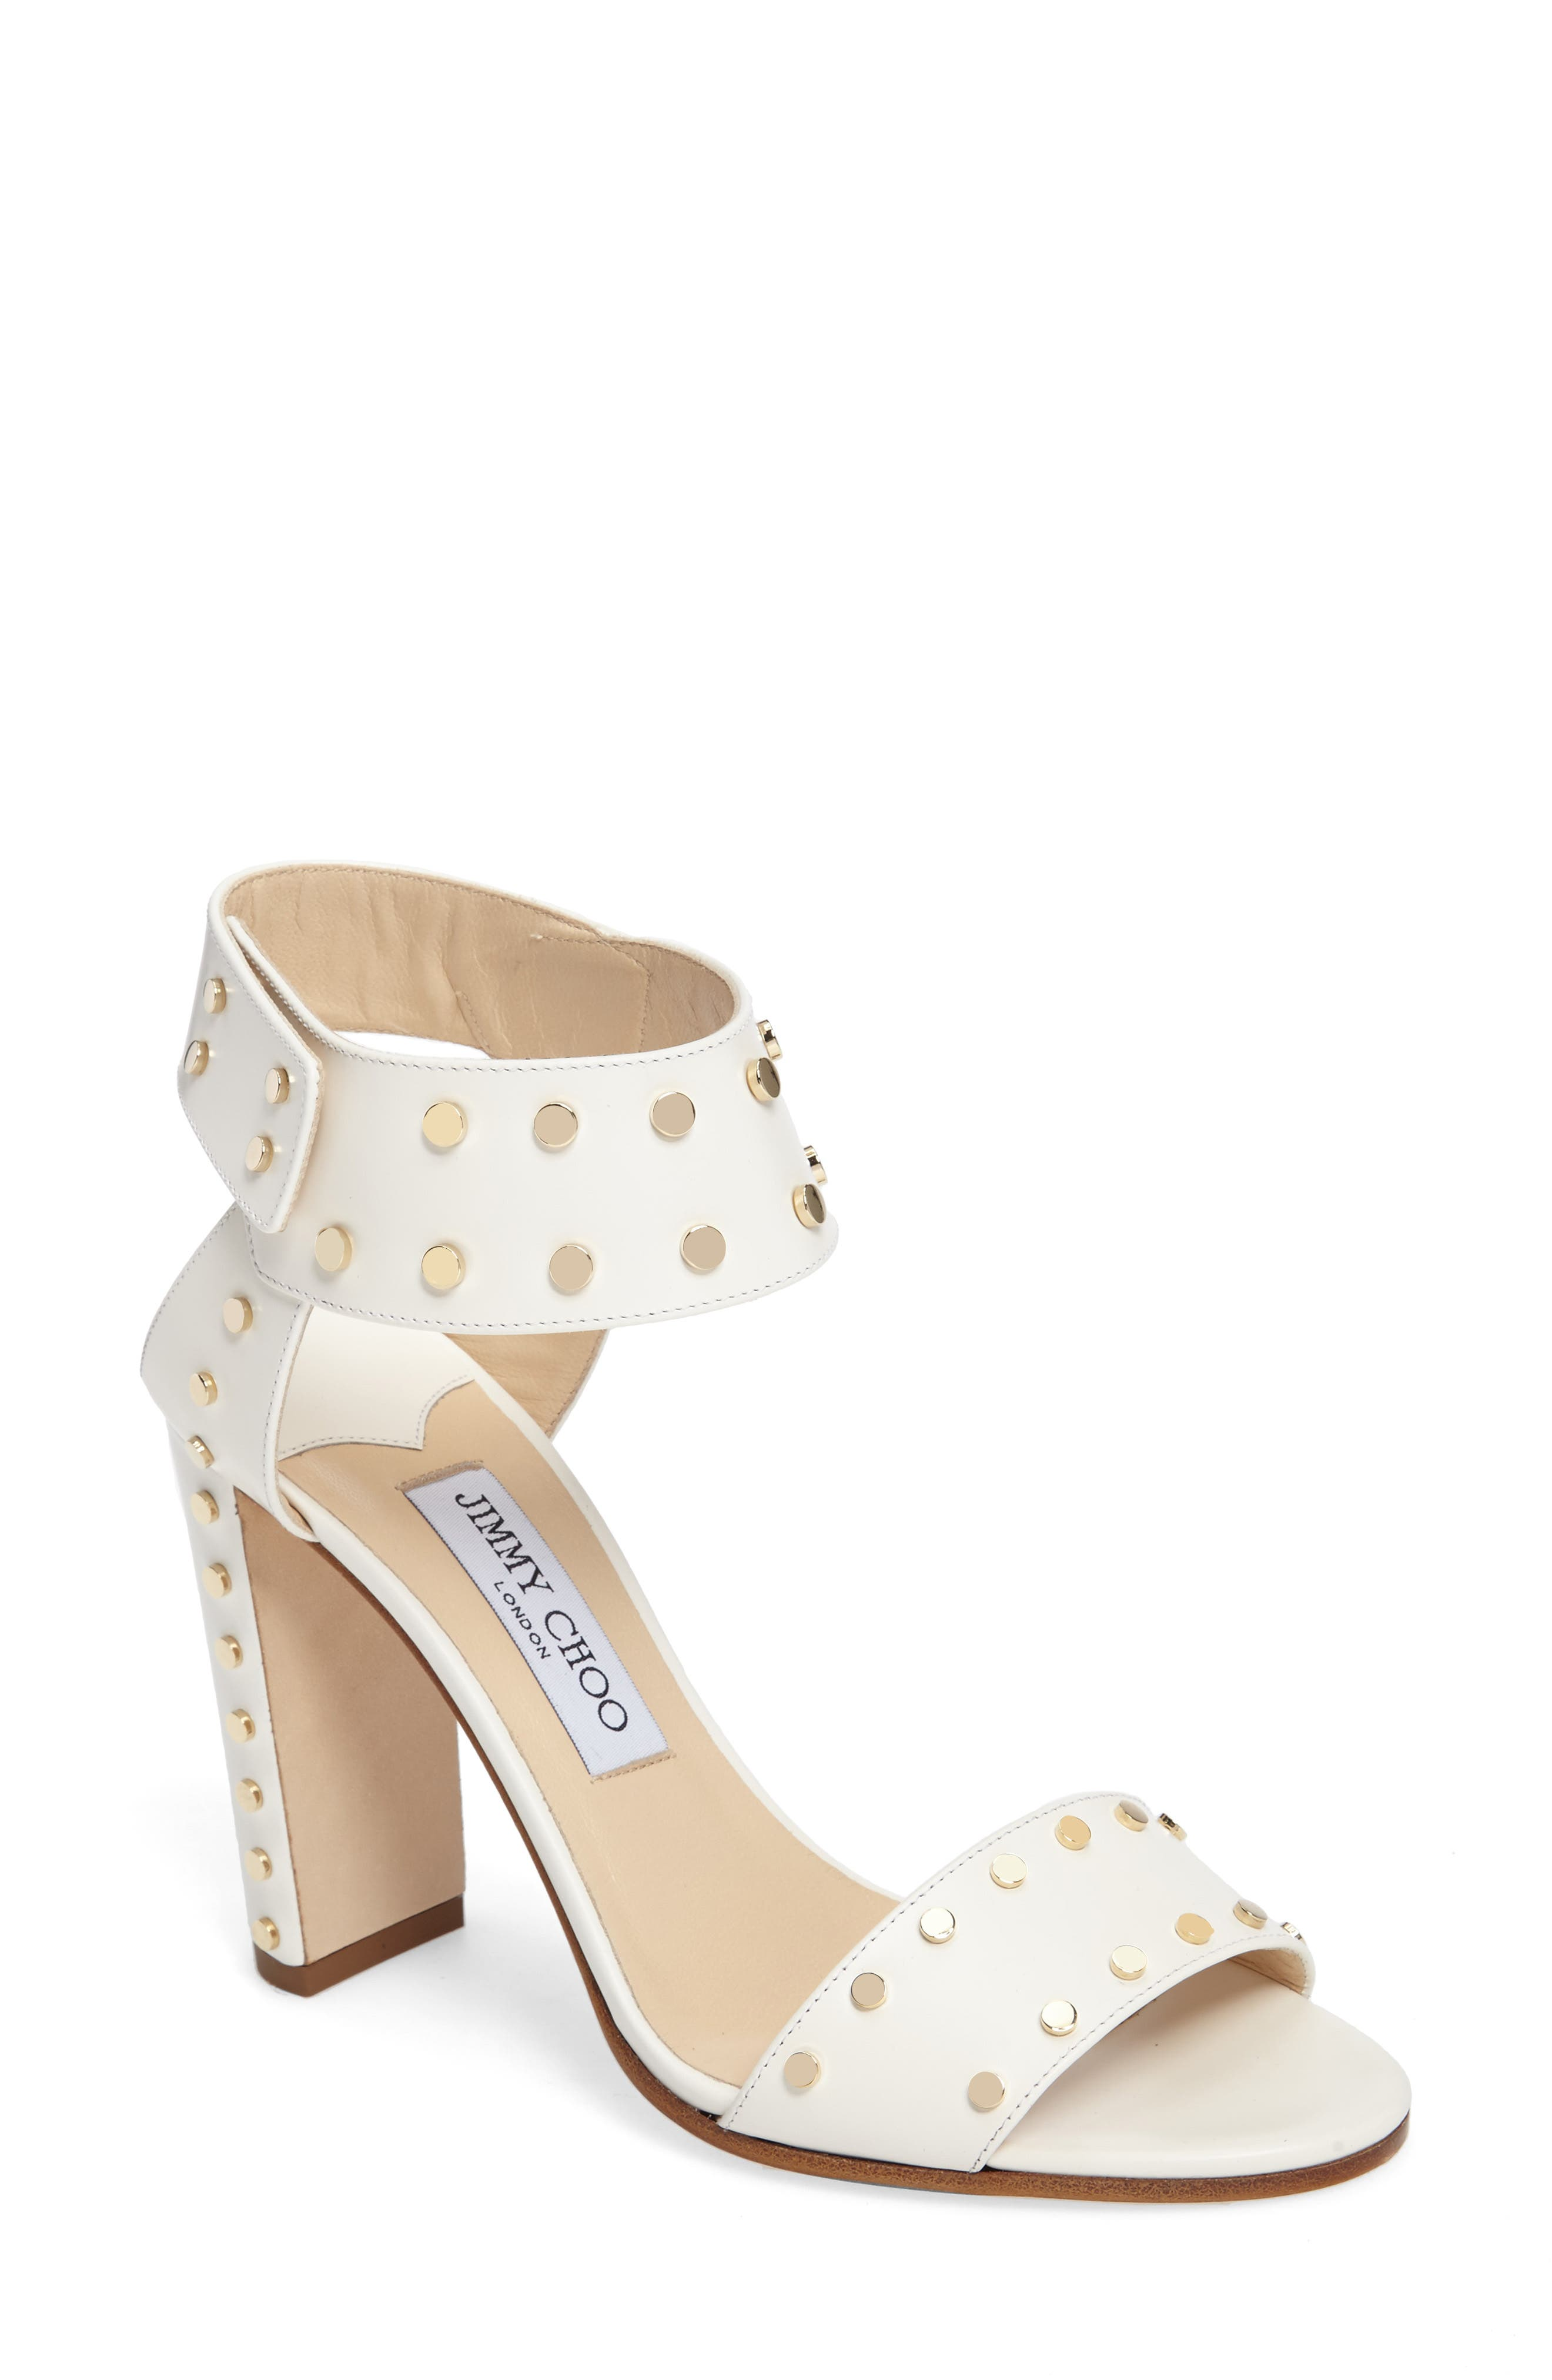 Alternate Image 1 Selected - Jimmy Choo Veto Studded Ankle Cuff Sandal (Women)